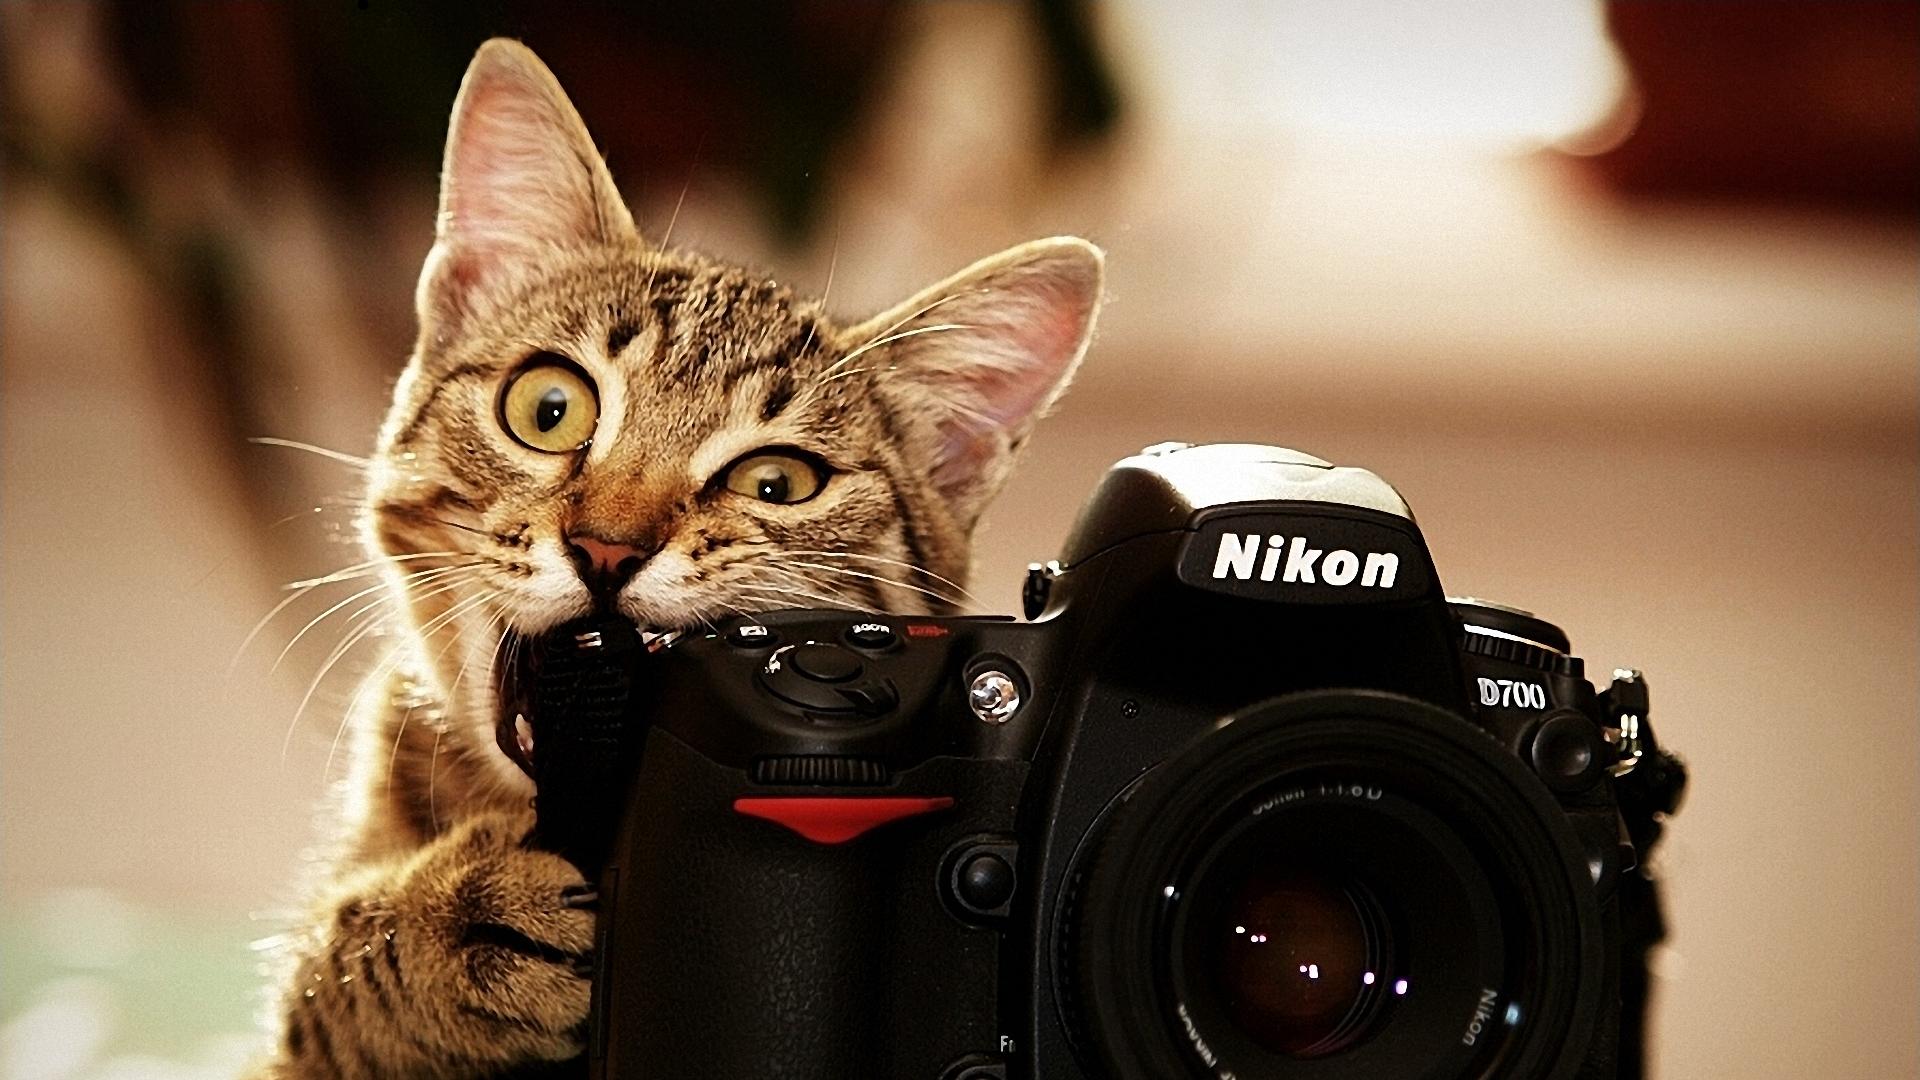 General 1920x1080 camera Nikon animals biting cats beige mammals numbers animal eyes